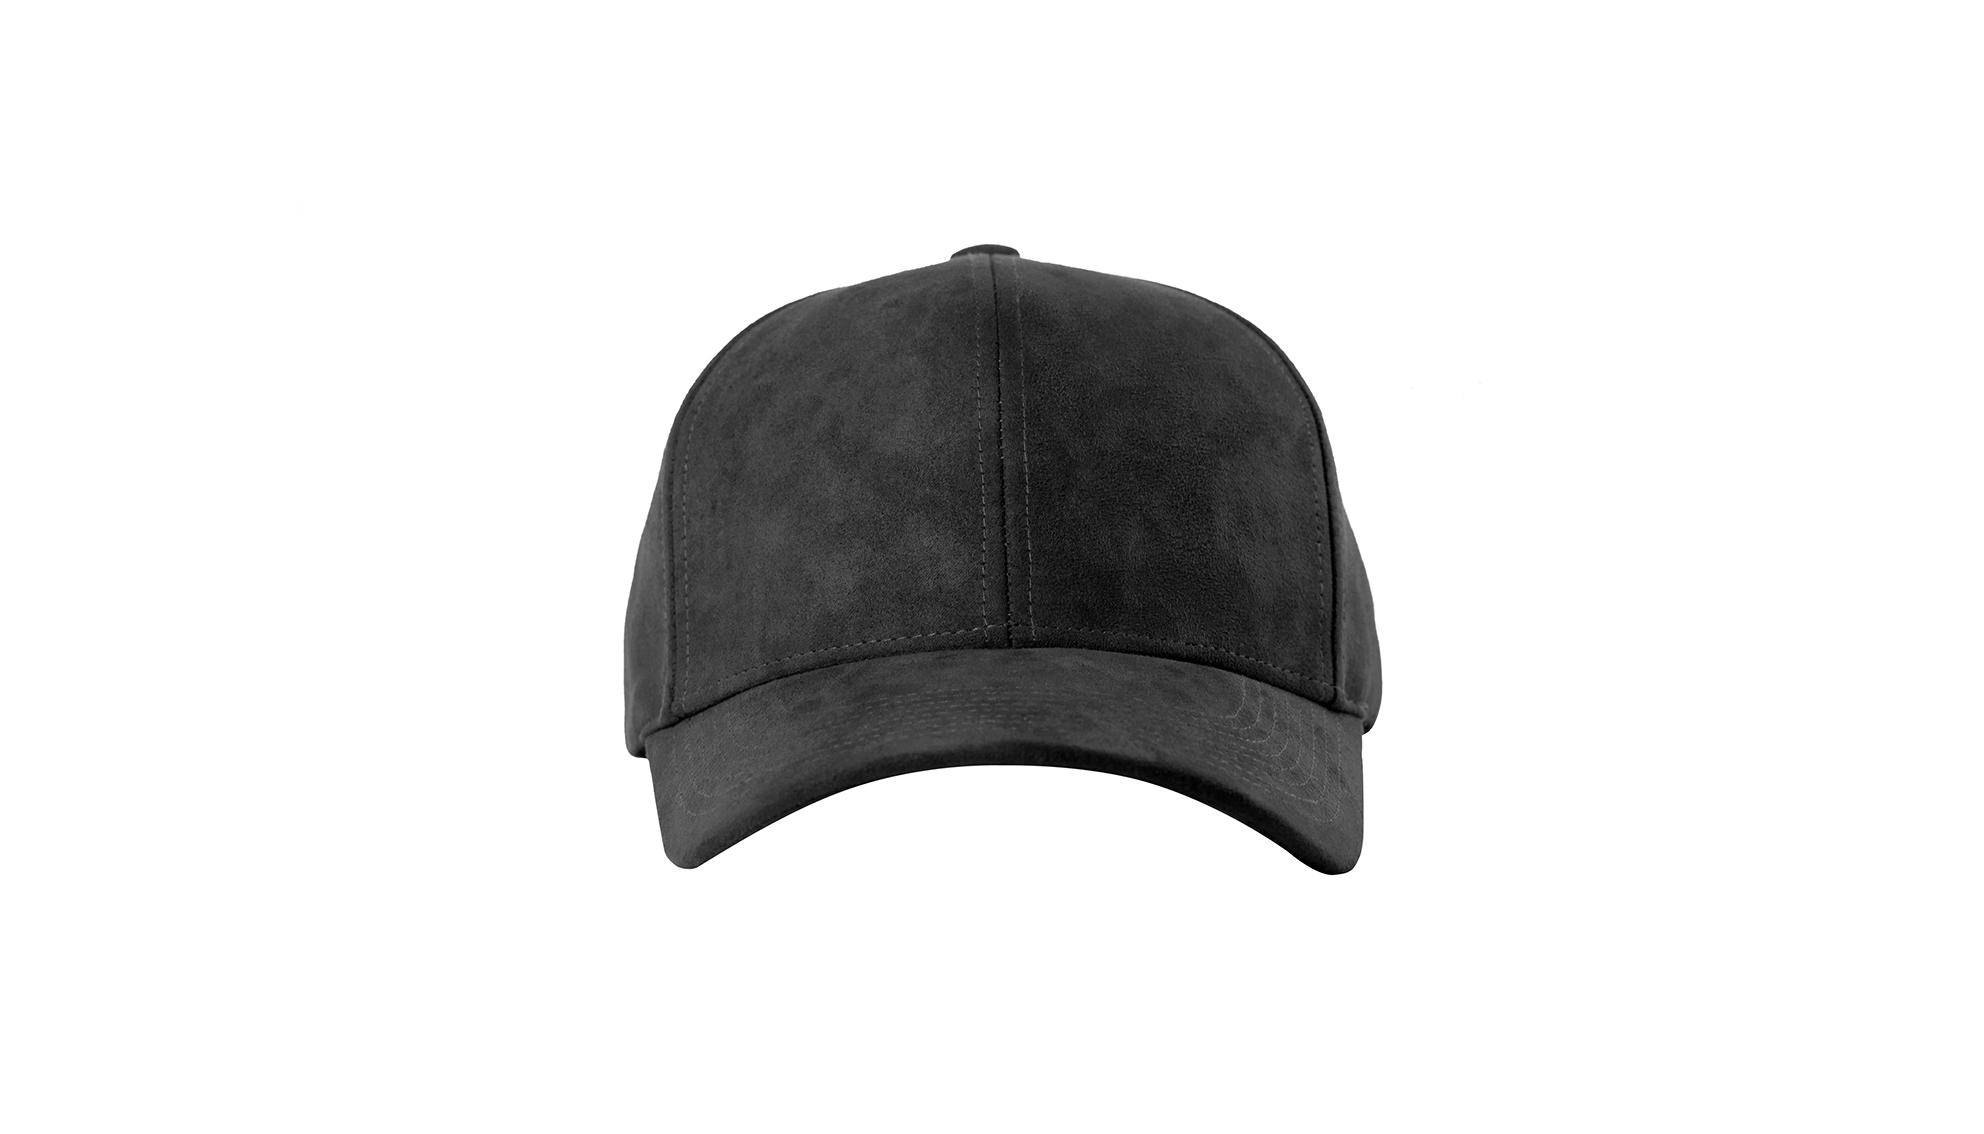 DSLINE BASEBALL CAP ANTHRACITE SUEDE   FROZEN GREY - DSLINE BASICS a9de19040f8